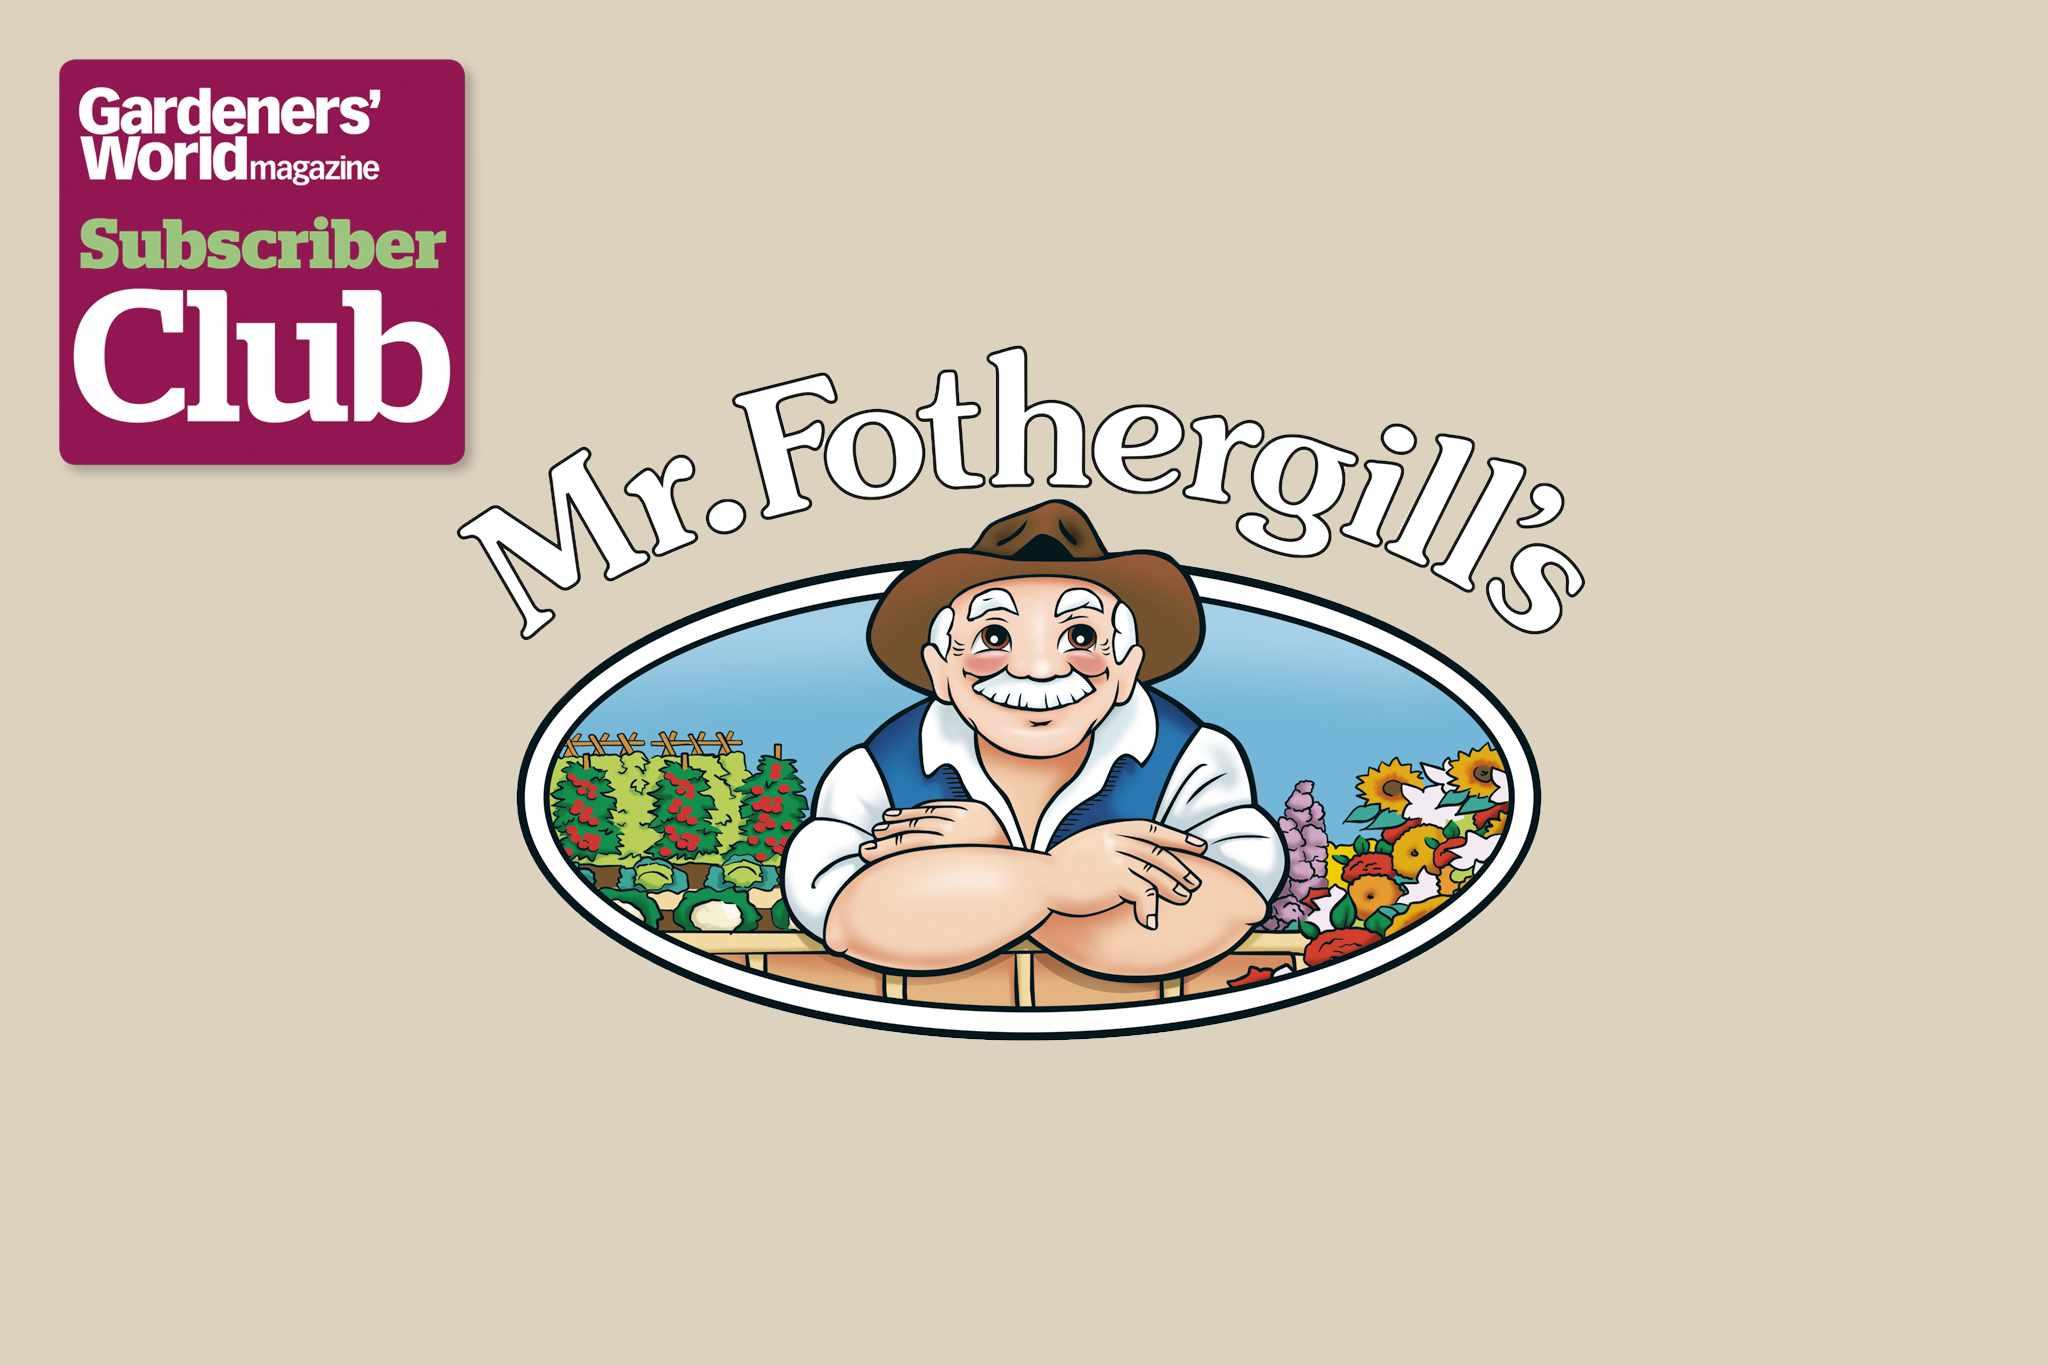 Mr Fothergill's BBC Gardeners' World Magazine Subscriber Club discount